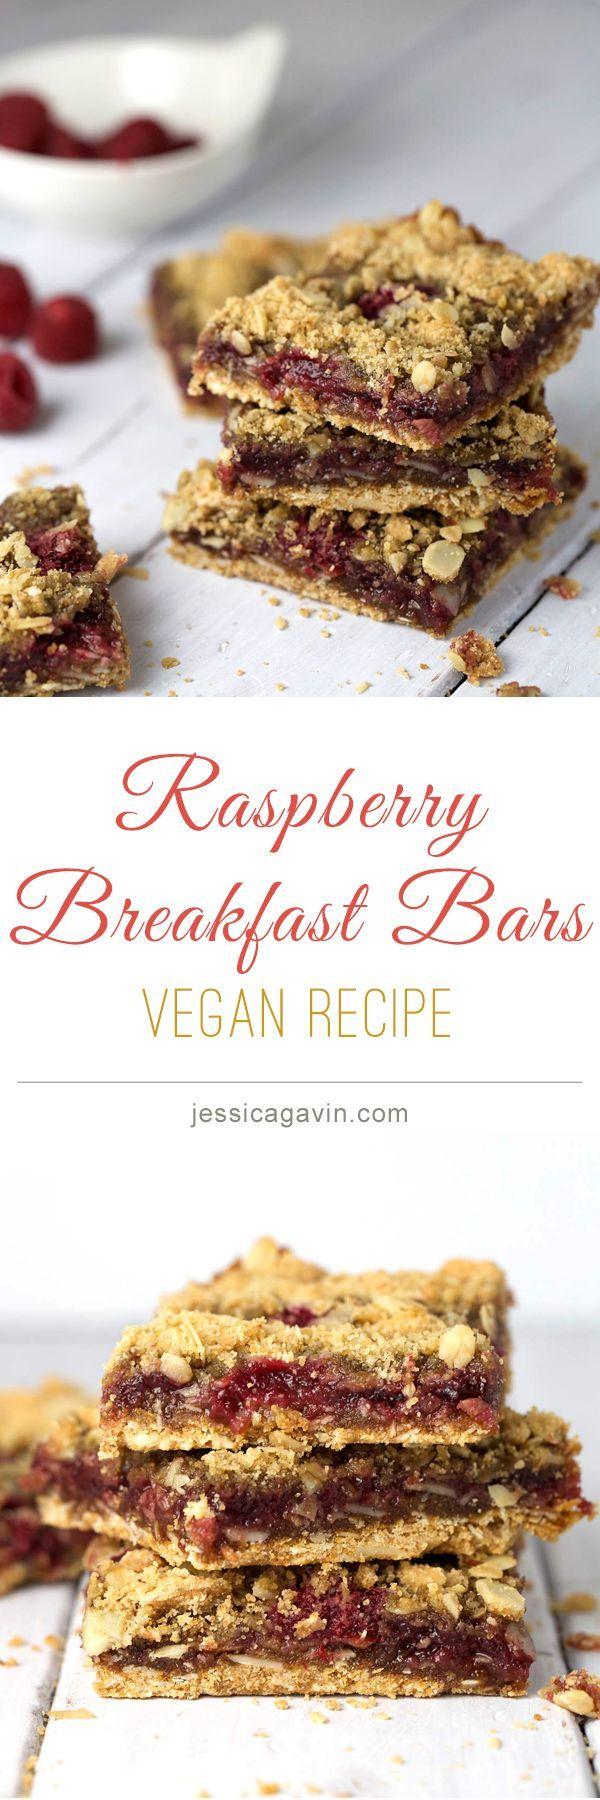 Vegan whole grain raspberry breakfast bars   jessicagavin.com #veganrecipes